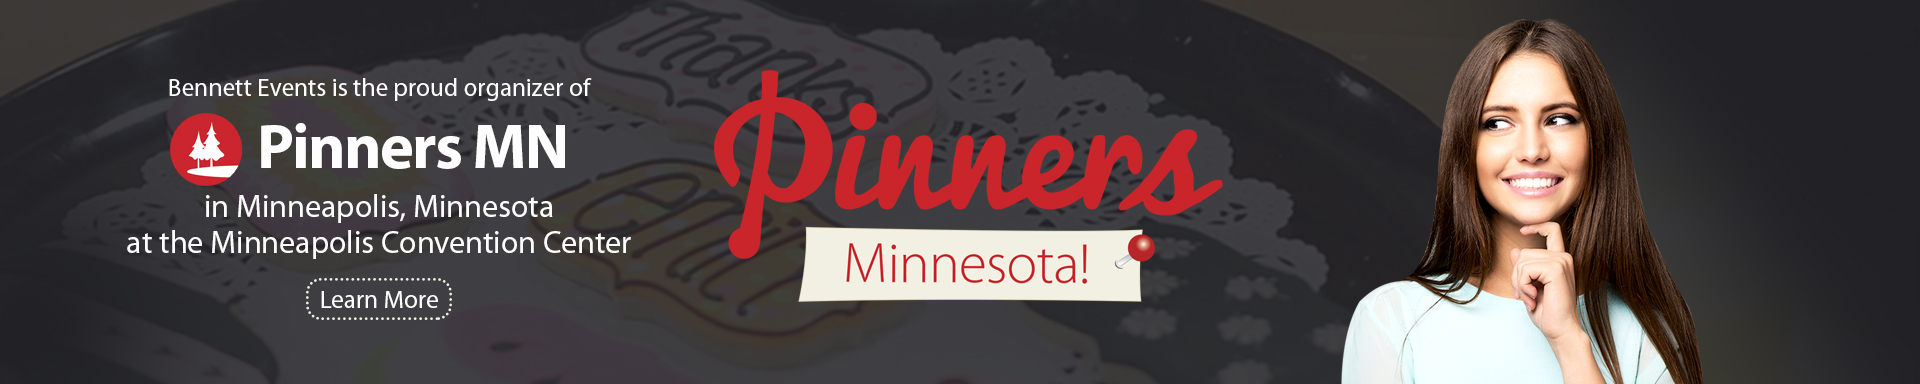 Pinners Minnesota